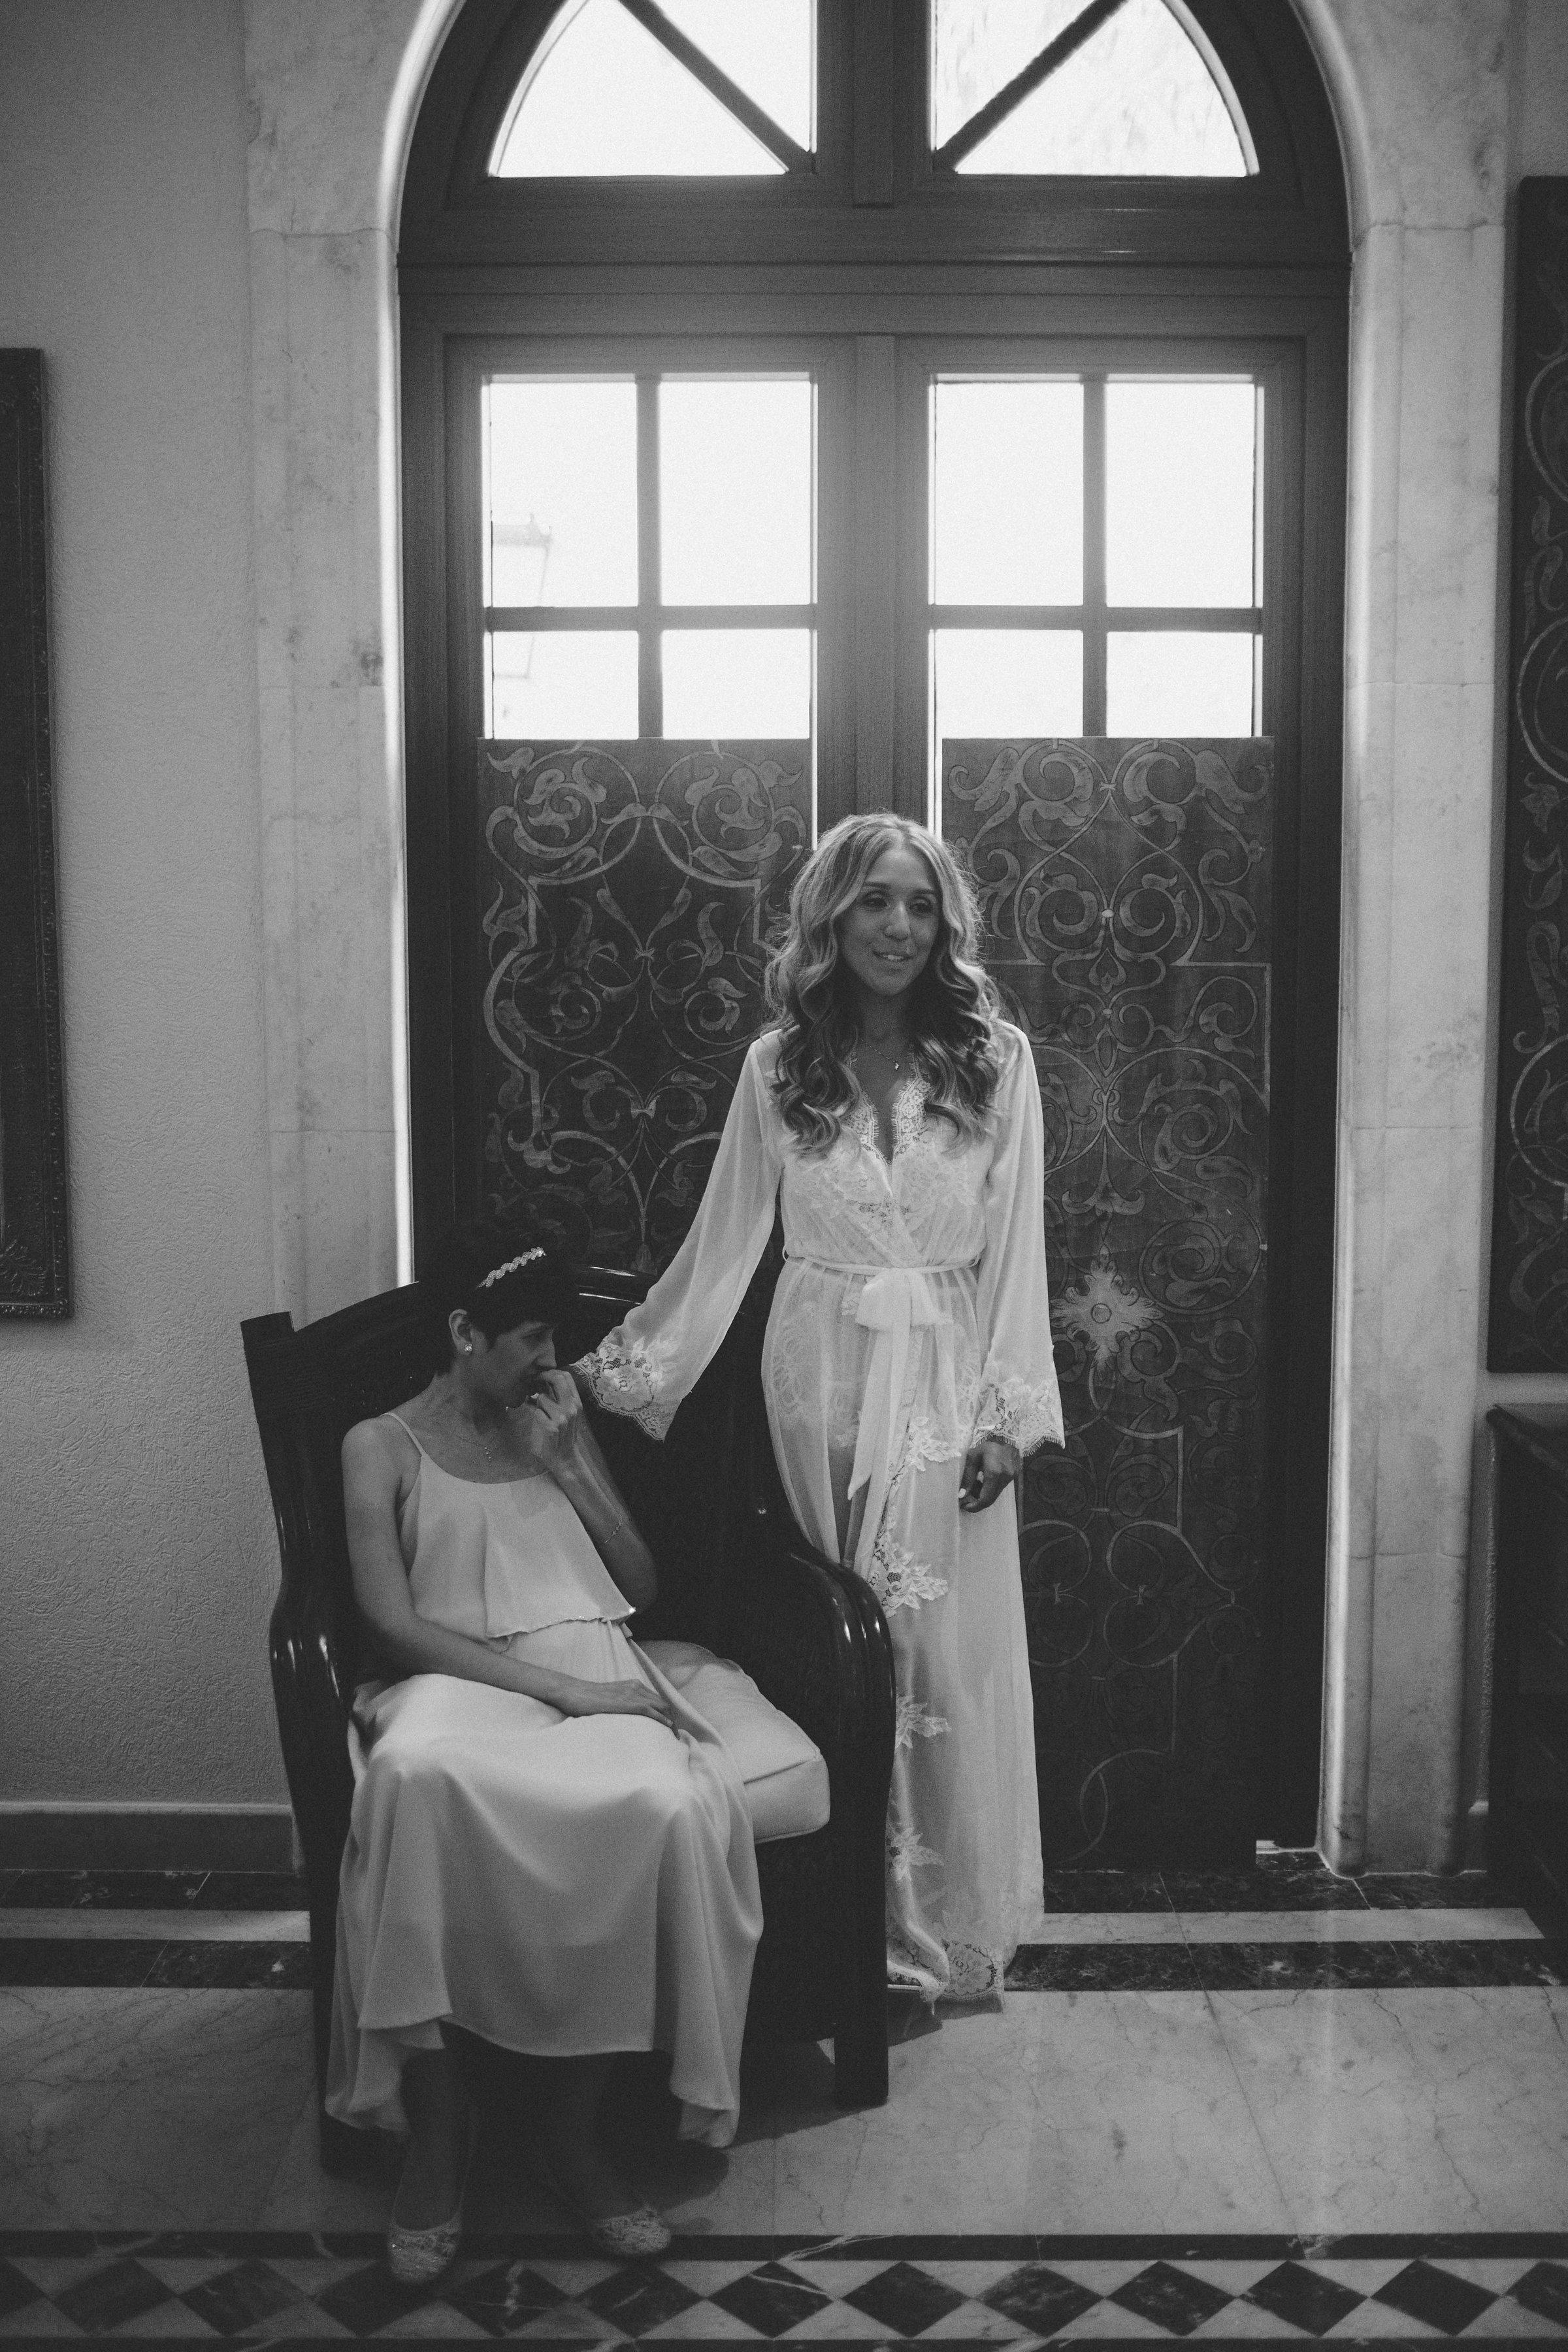 mexico_wedding_cancun_villa_la_joya_evangeline_lane_020.jpg